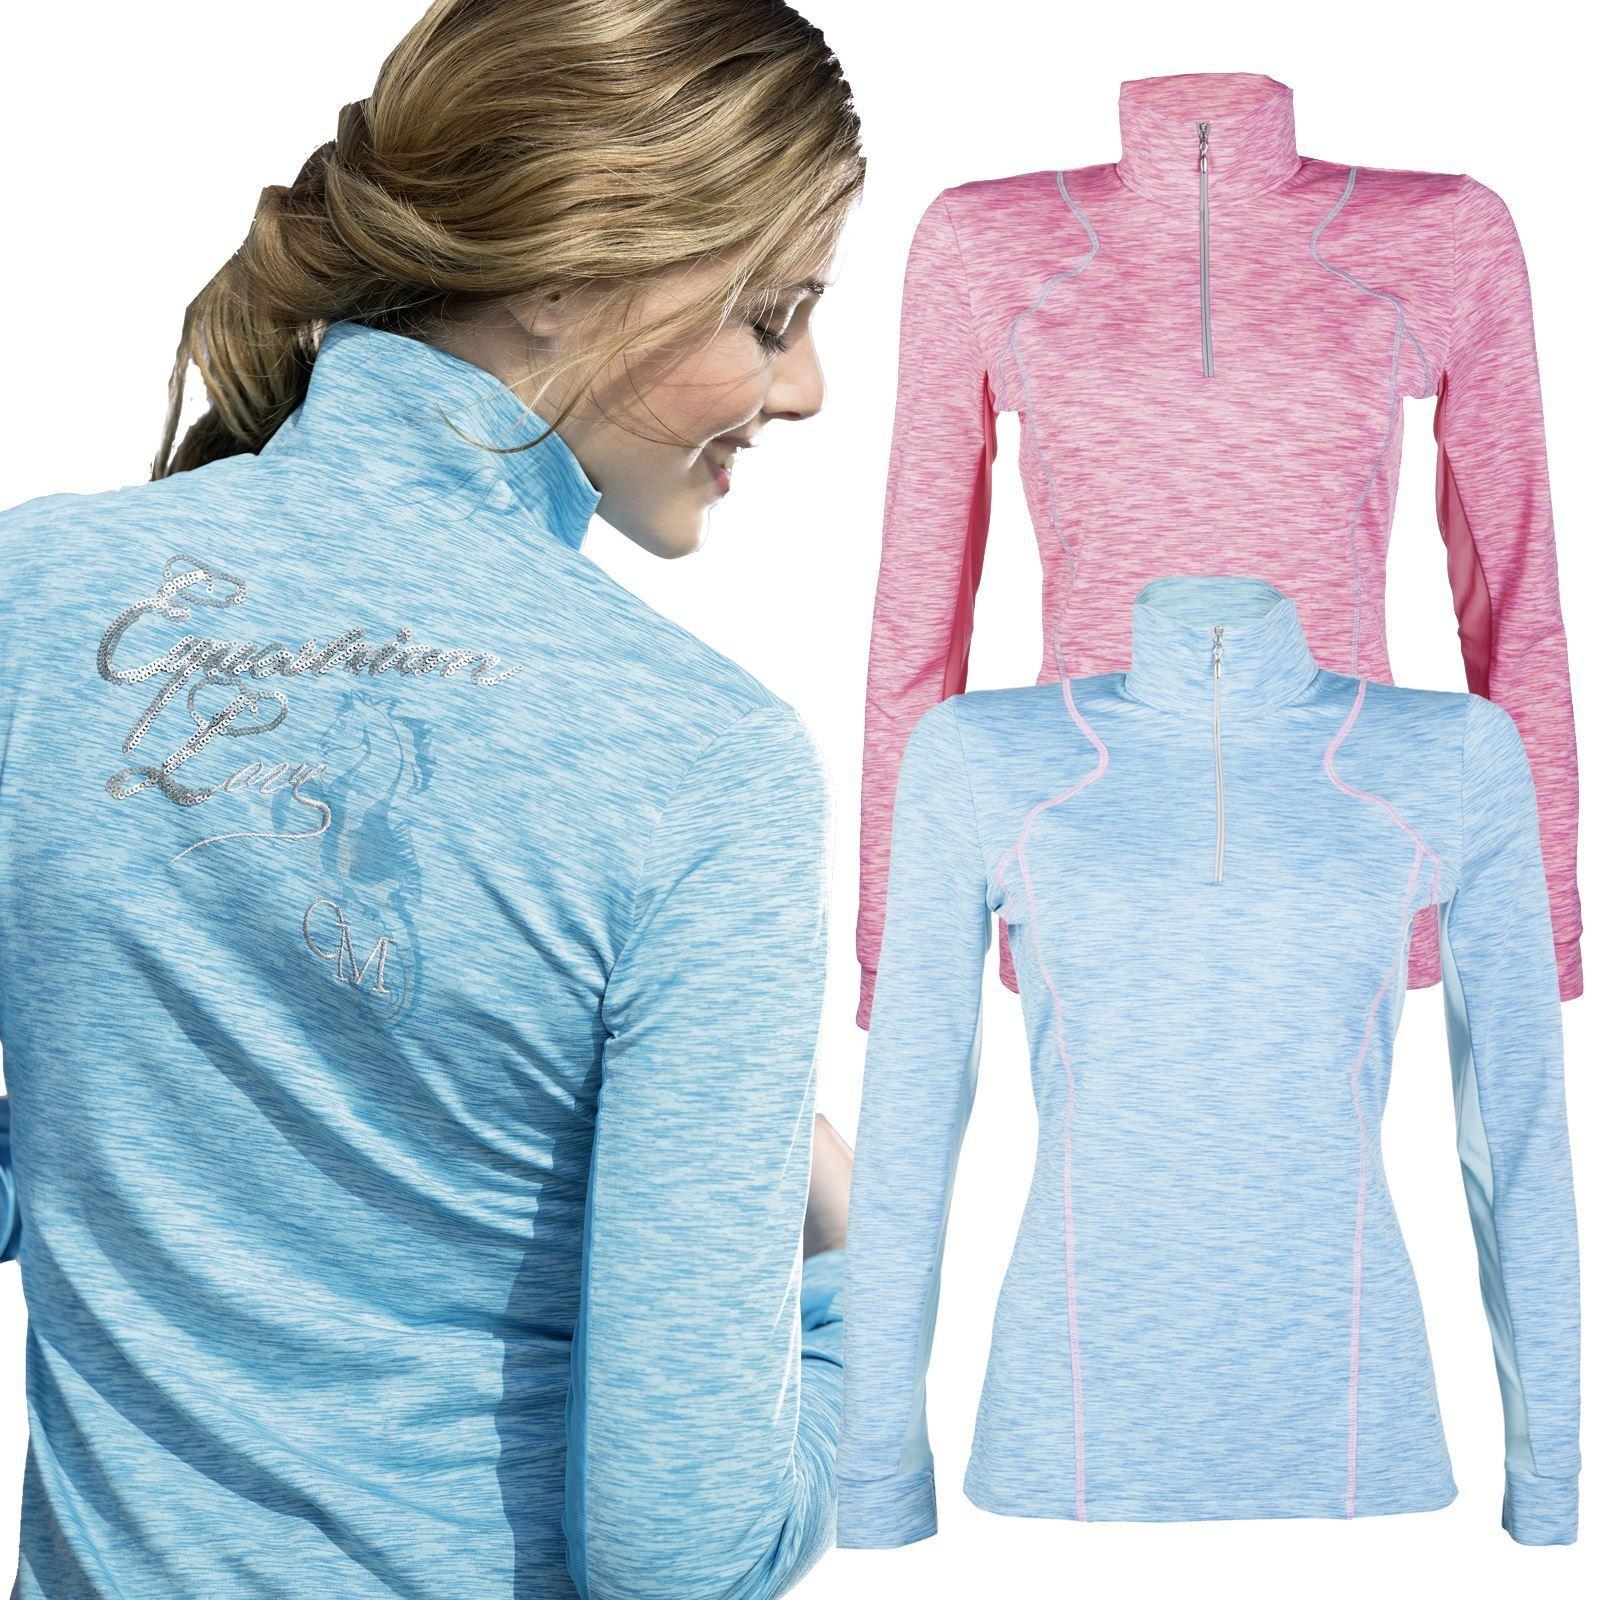 Cavallino Marino Rimini Shirt - Ladies Breathable Horse Riding Stretch Function